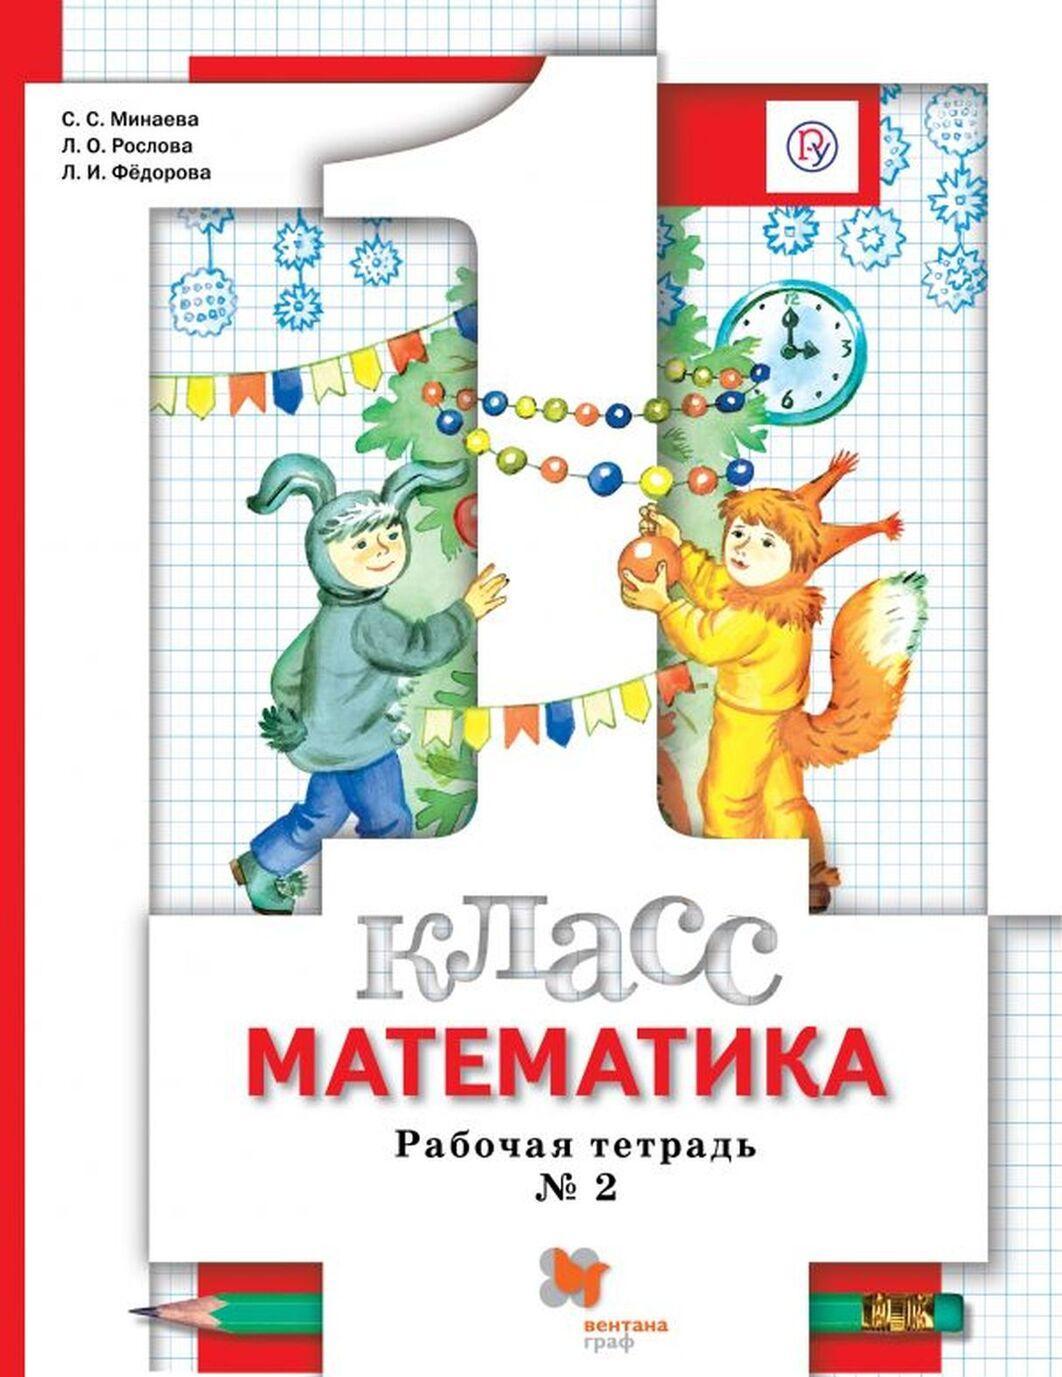 Matematika. 1klass. Rabochaja tetrad № 2